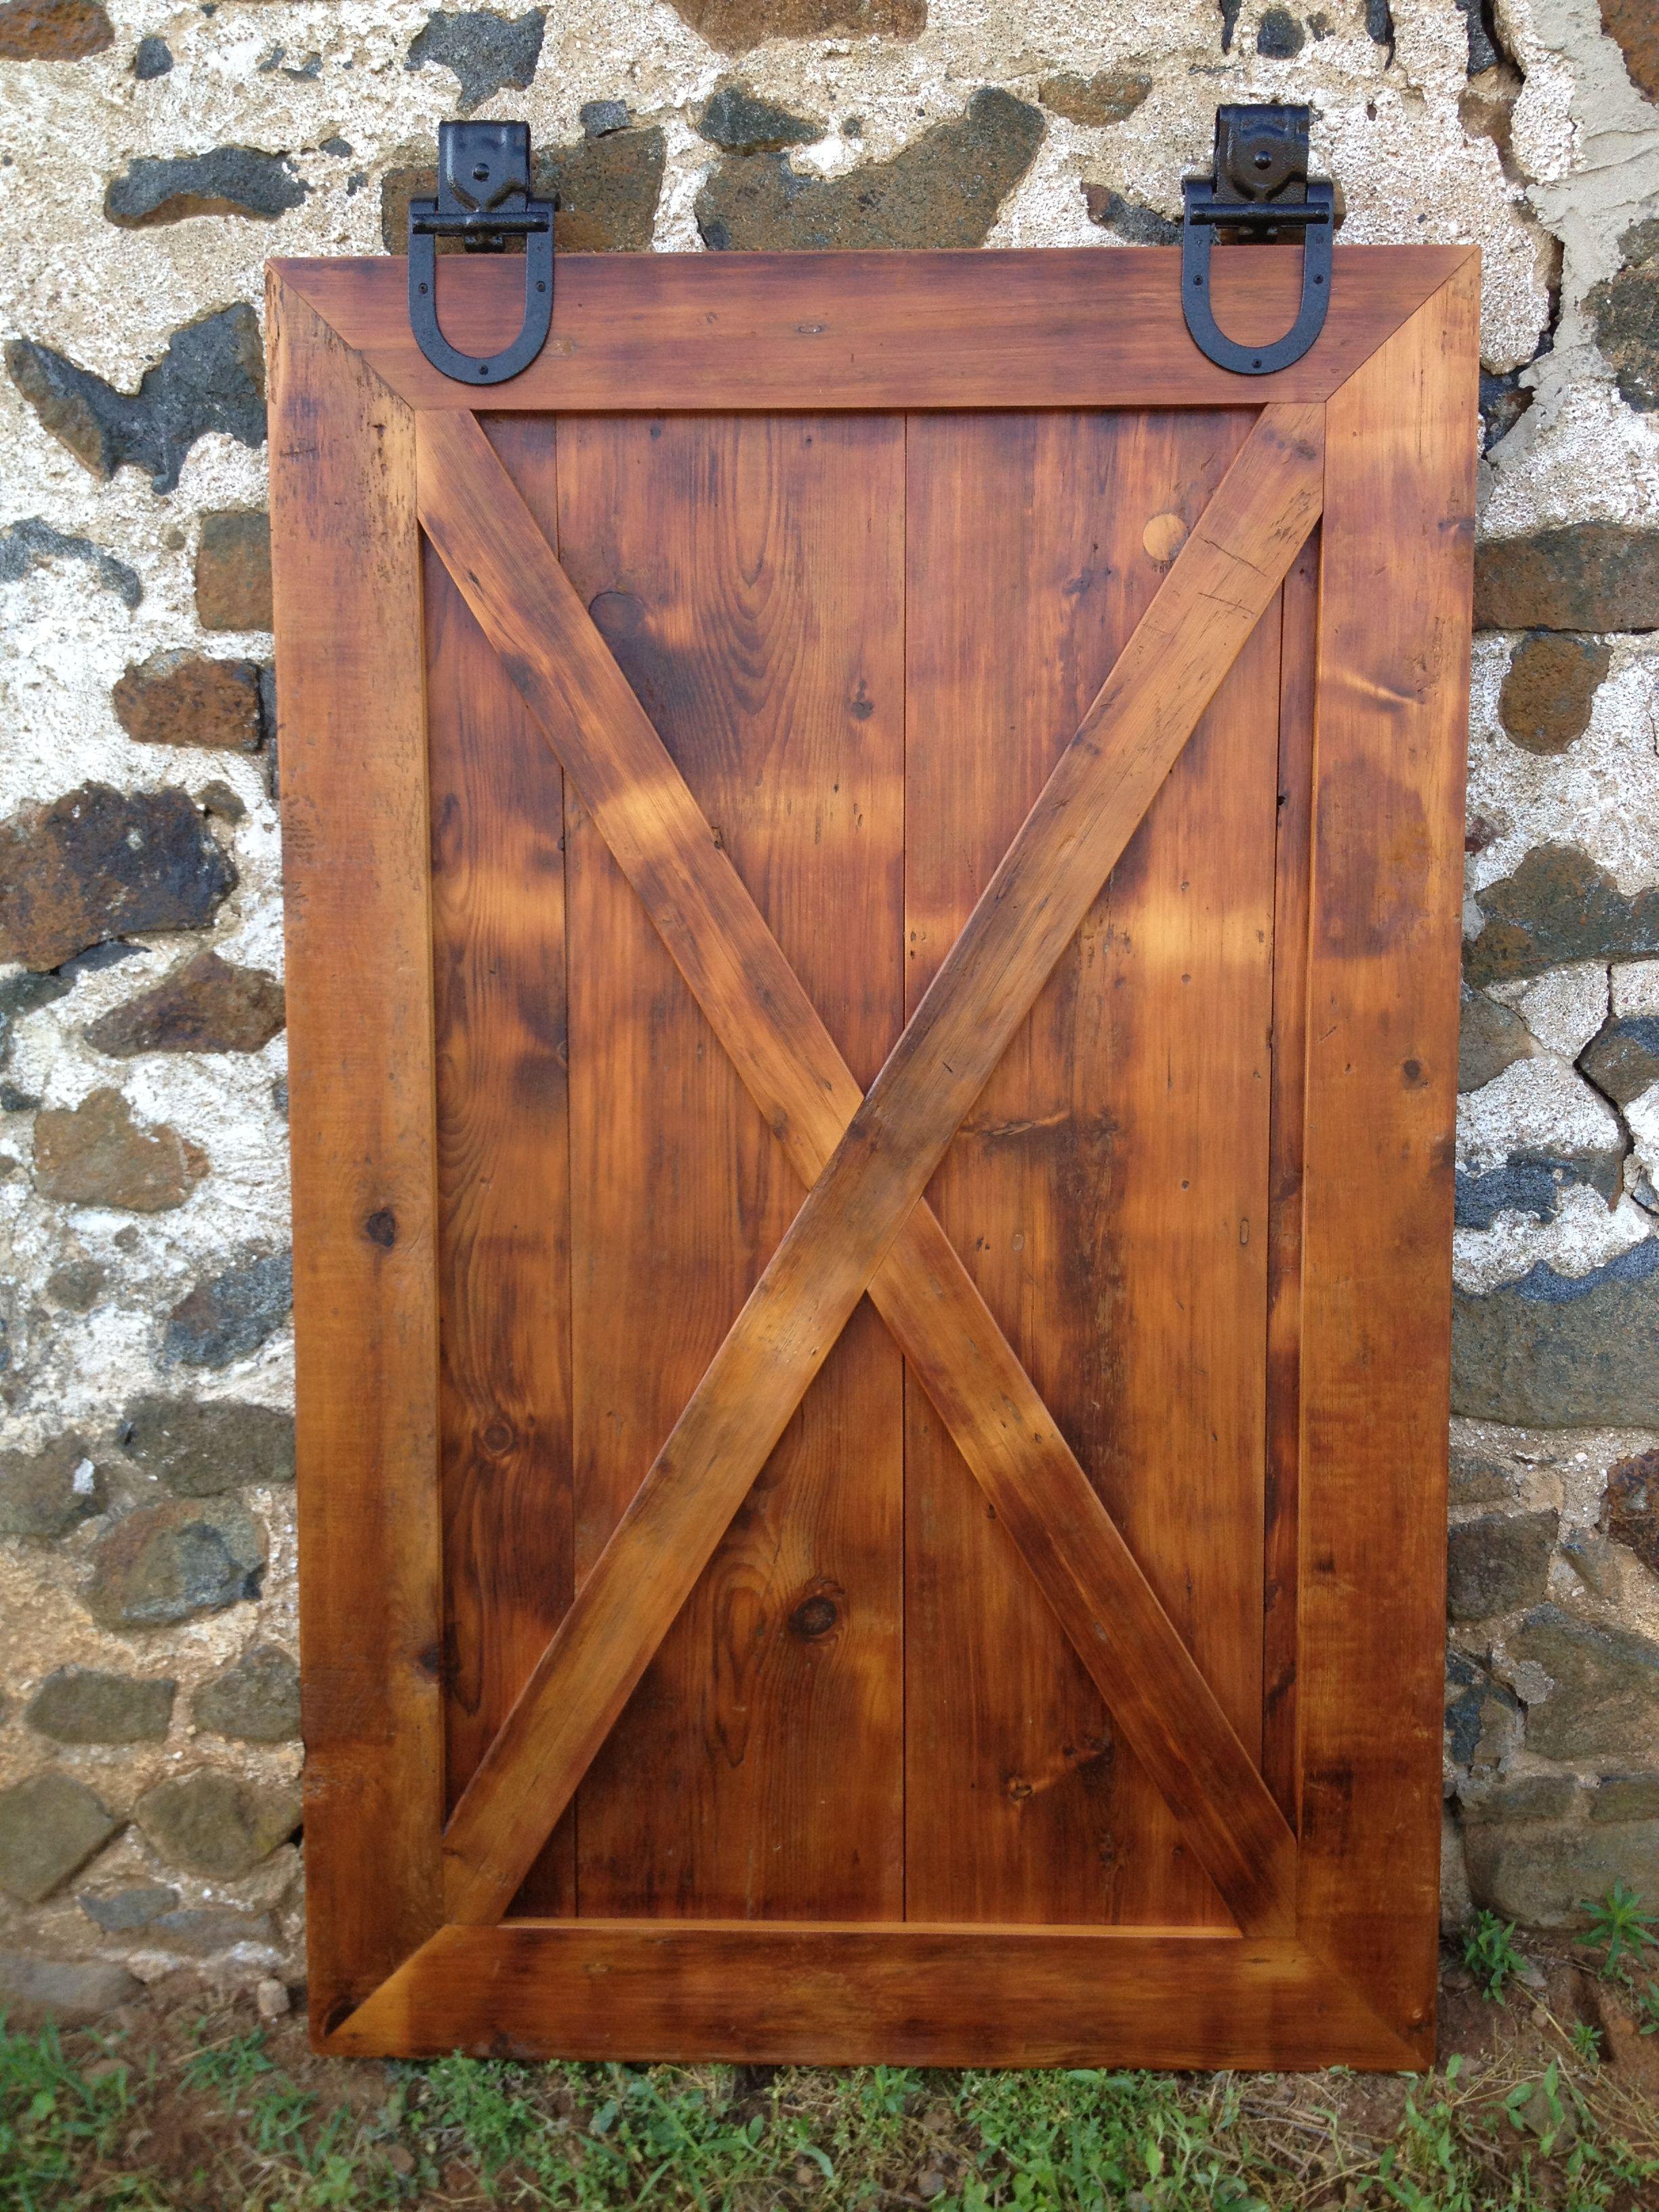 Furniture From The Barn Interior Wood Door